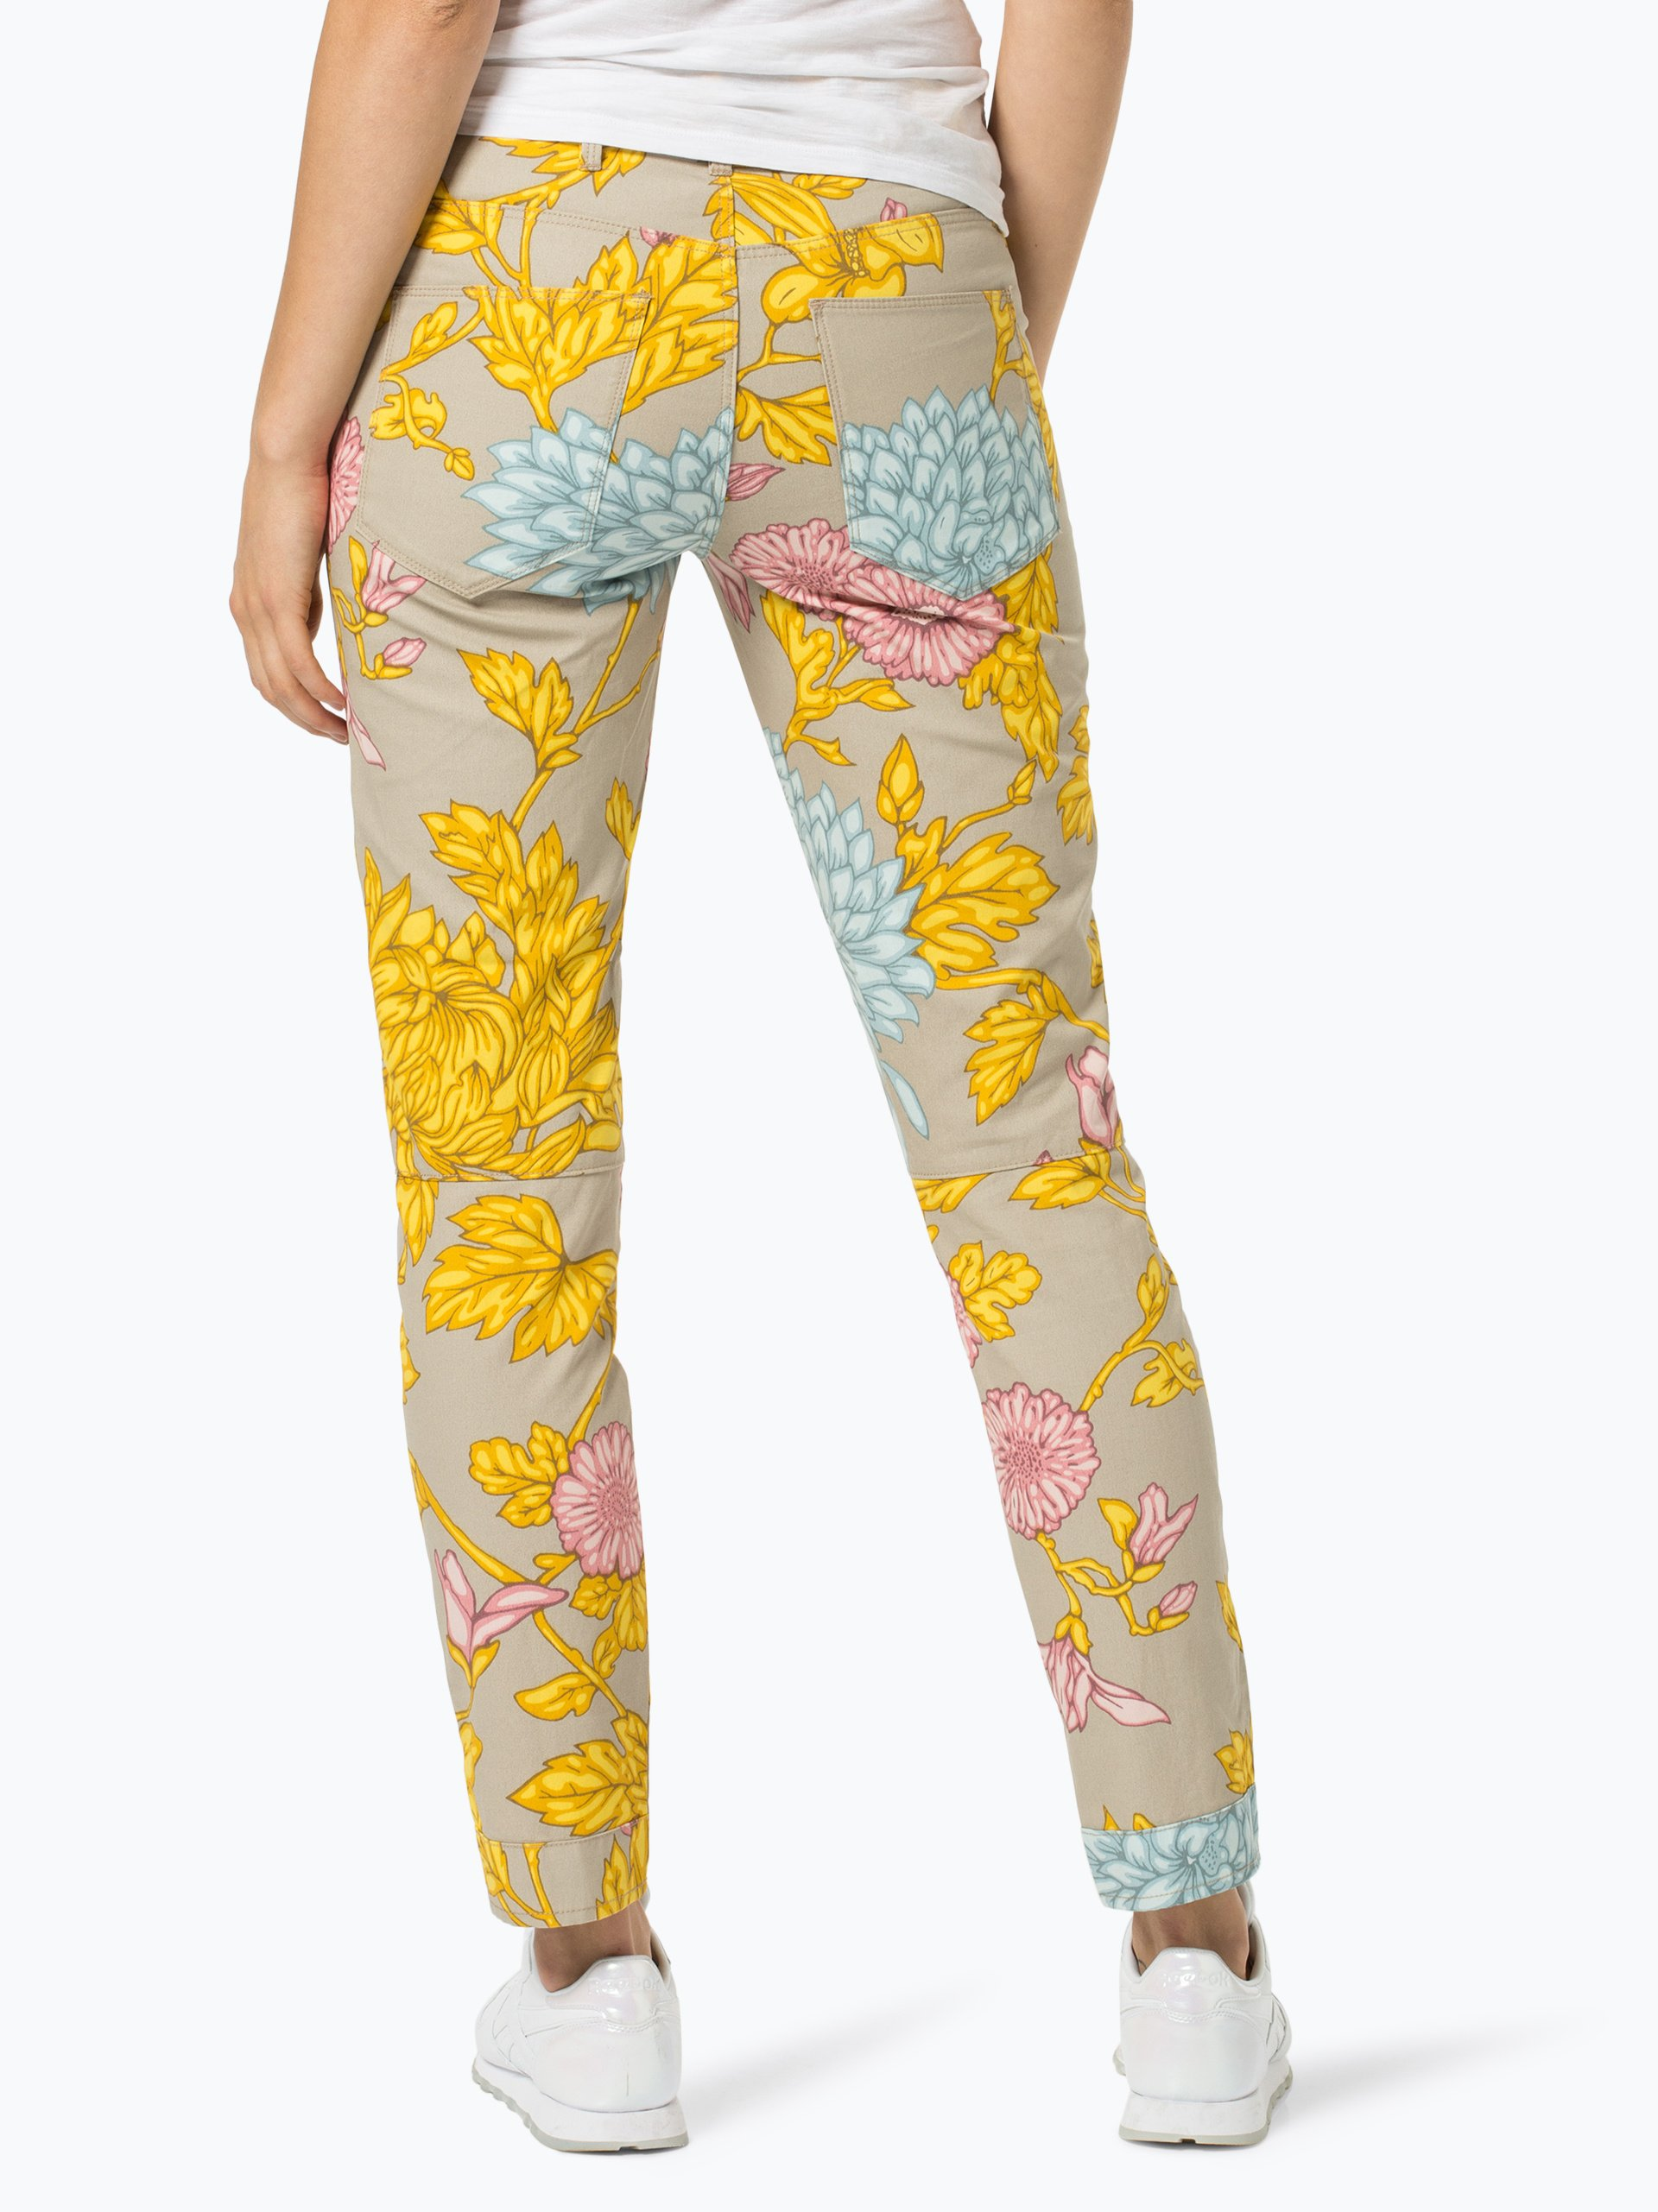 g star damen jeans elwood x25 khaki beige uni online. Black Bedroom Furniture Sets. Home Design Ideas